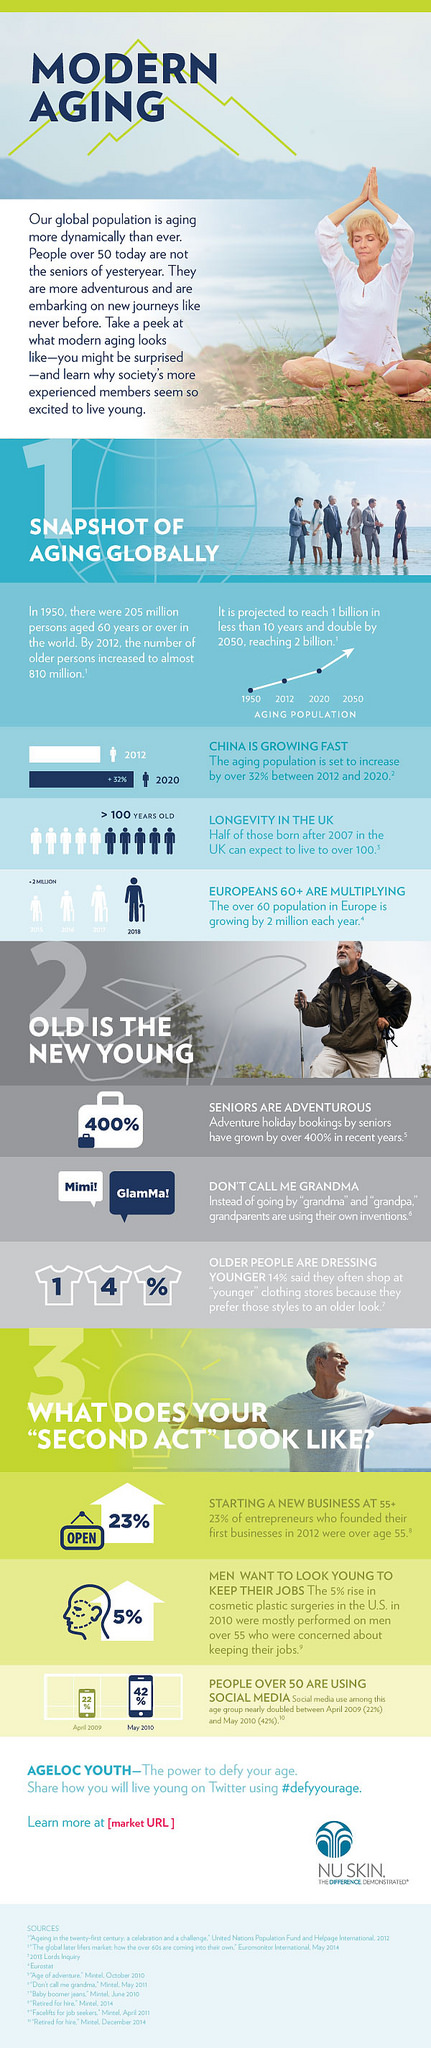 https://flic.kr/p/F6jbZR | ageLOC Youth Infographic 1